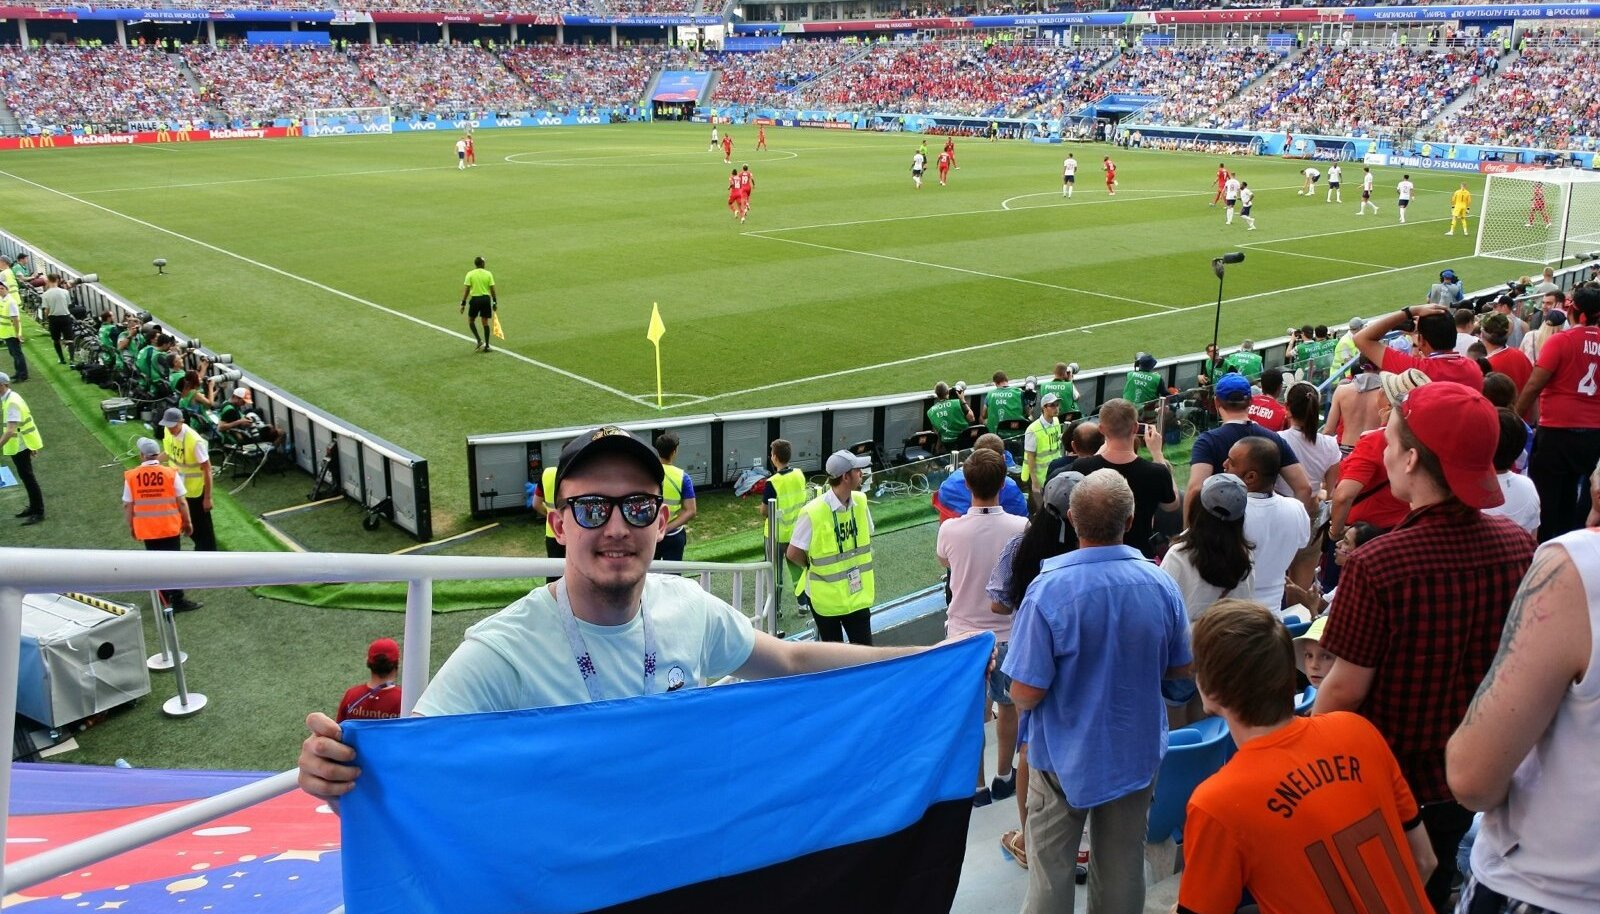 Inglismaa vs Panama Eesti lippuga